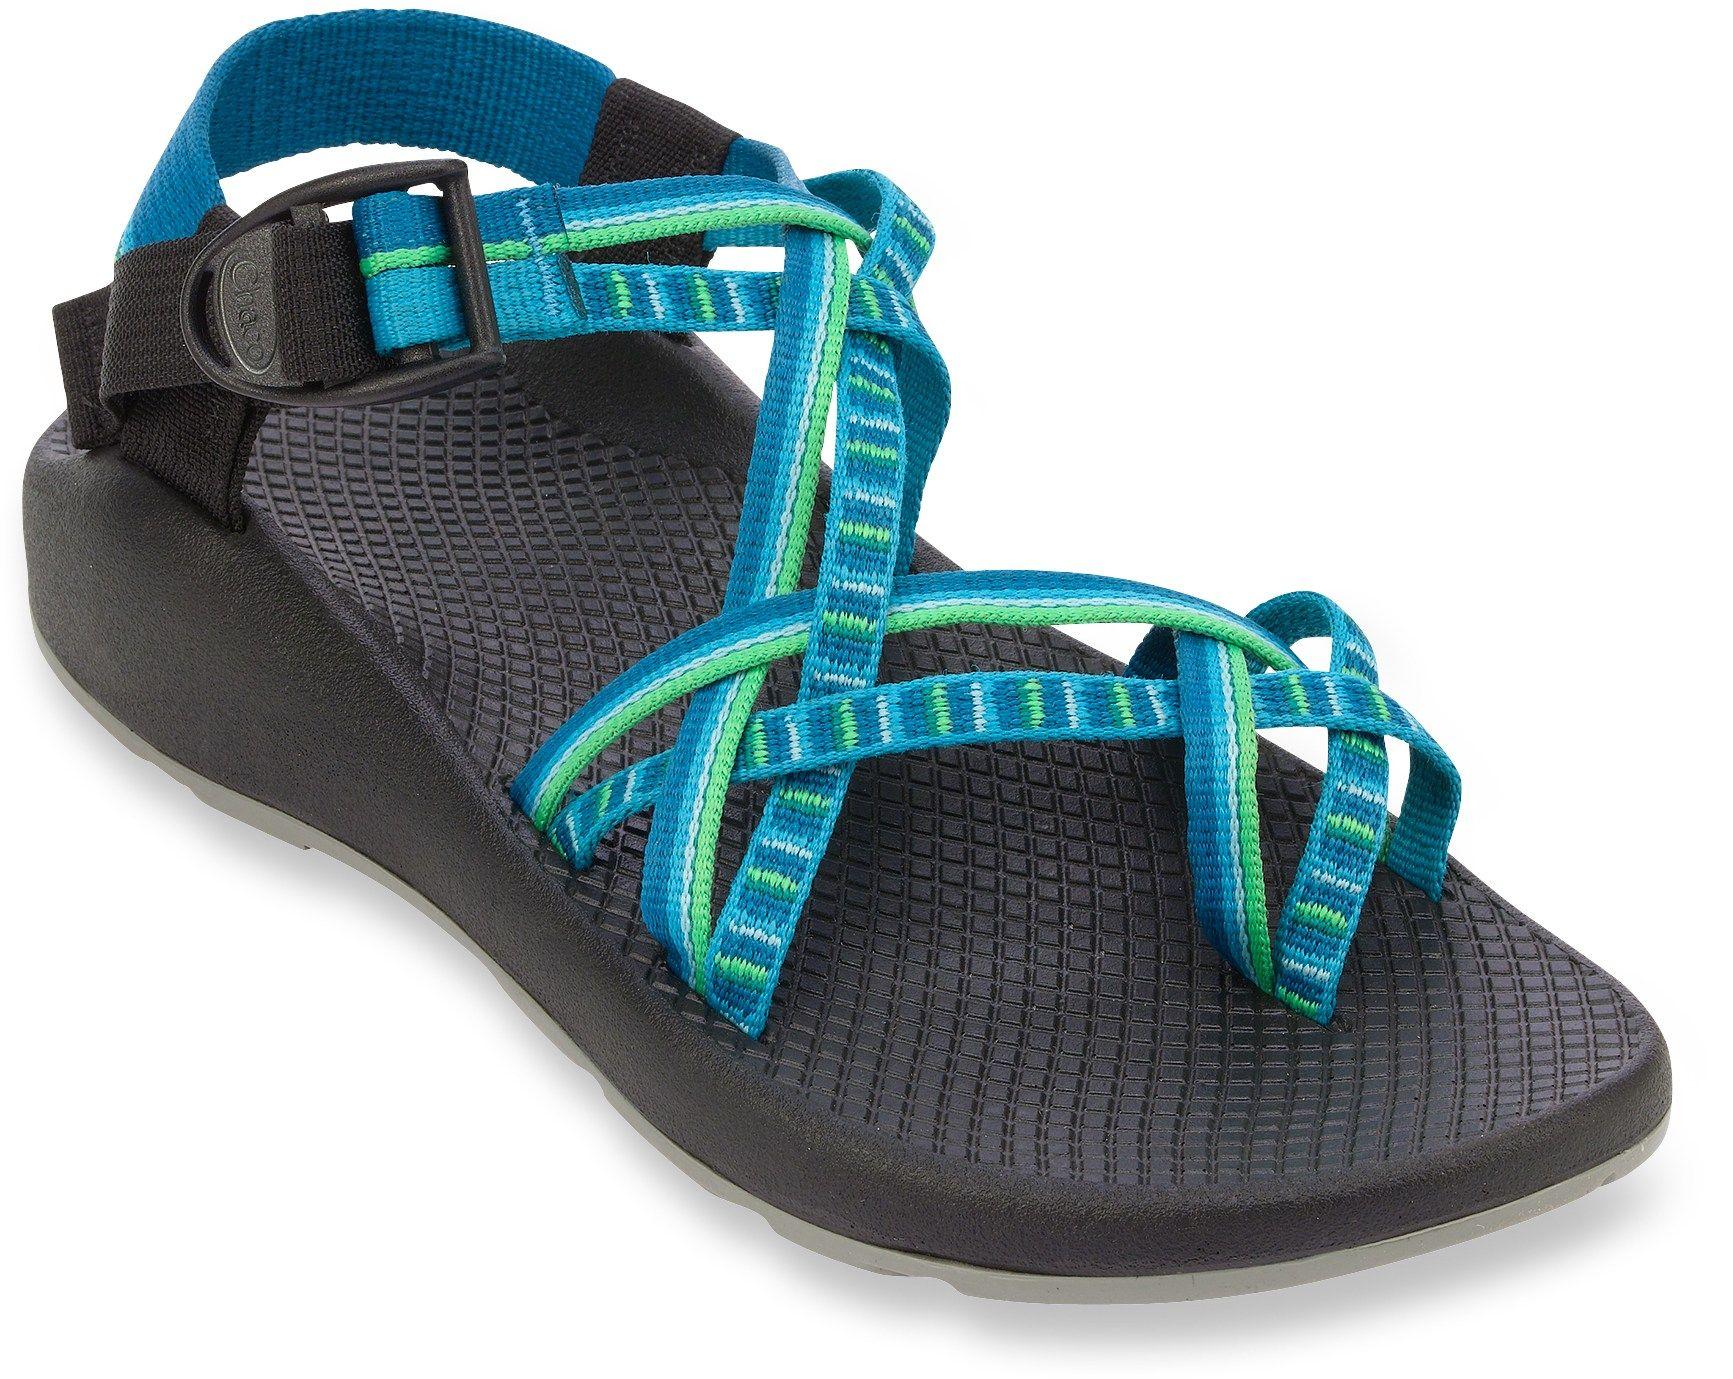 Womens sandals chaco - Chaco Women S Zx 2 Yampa Sandals Black 6 Medium